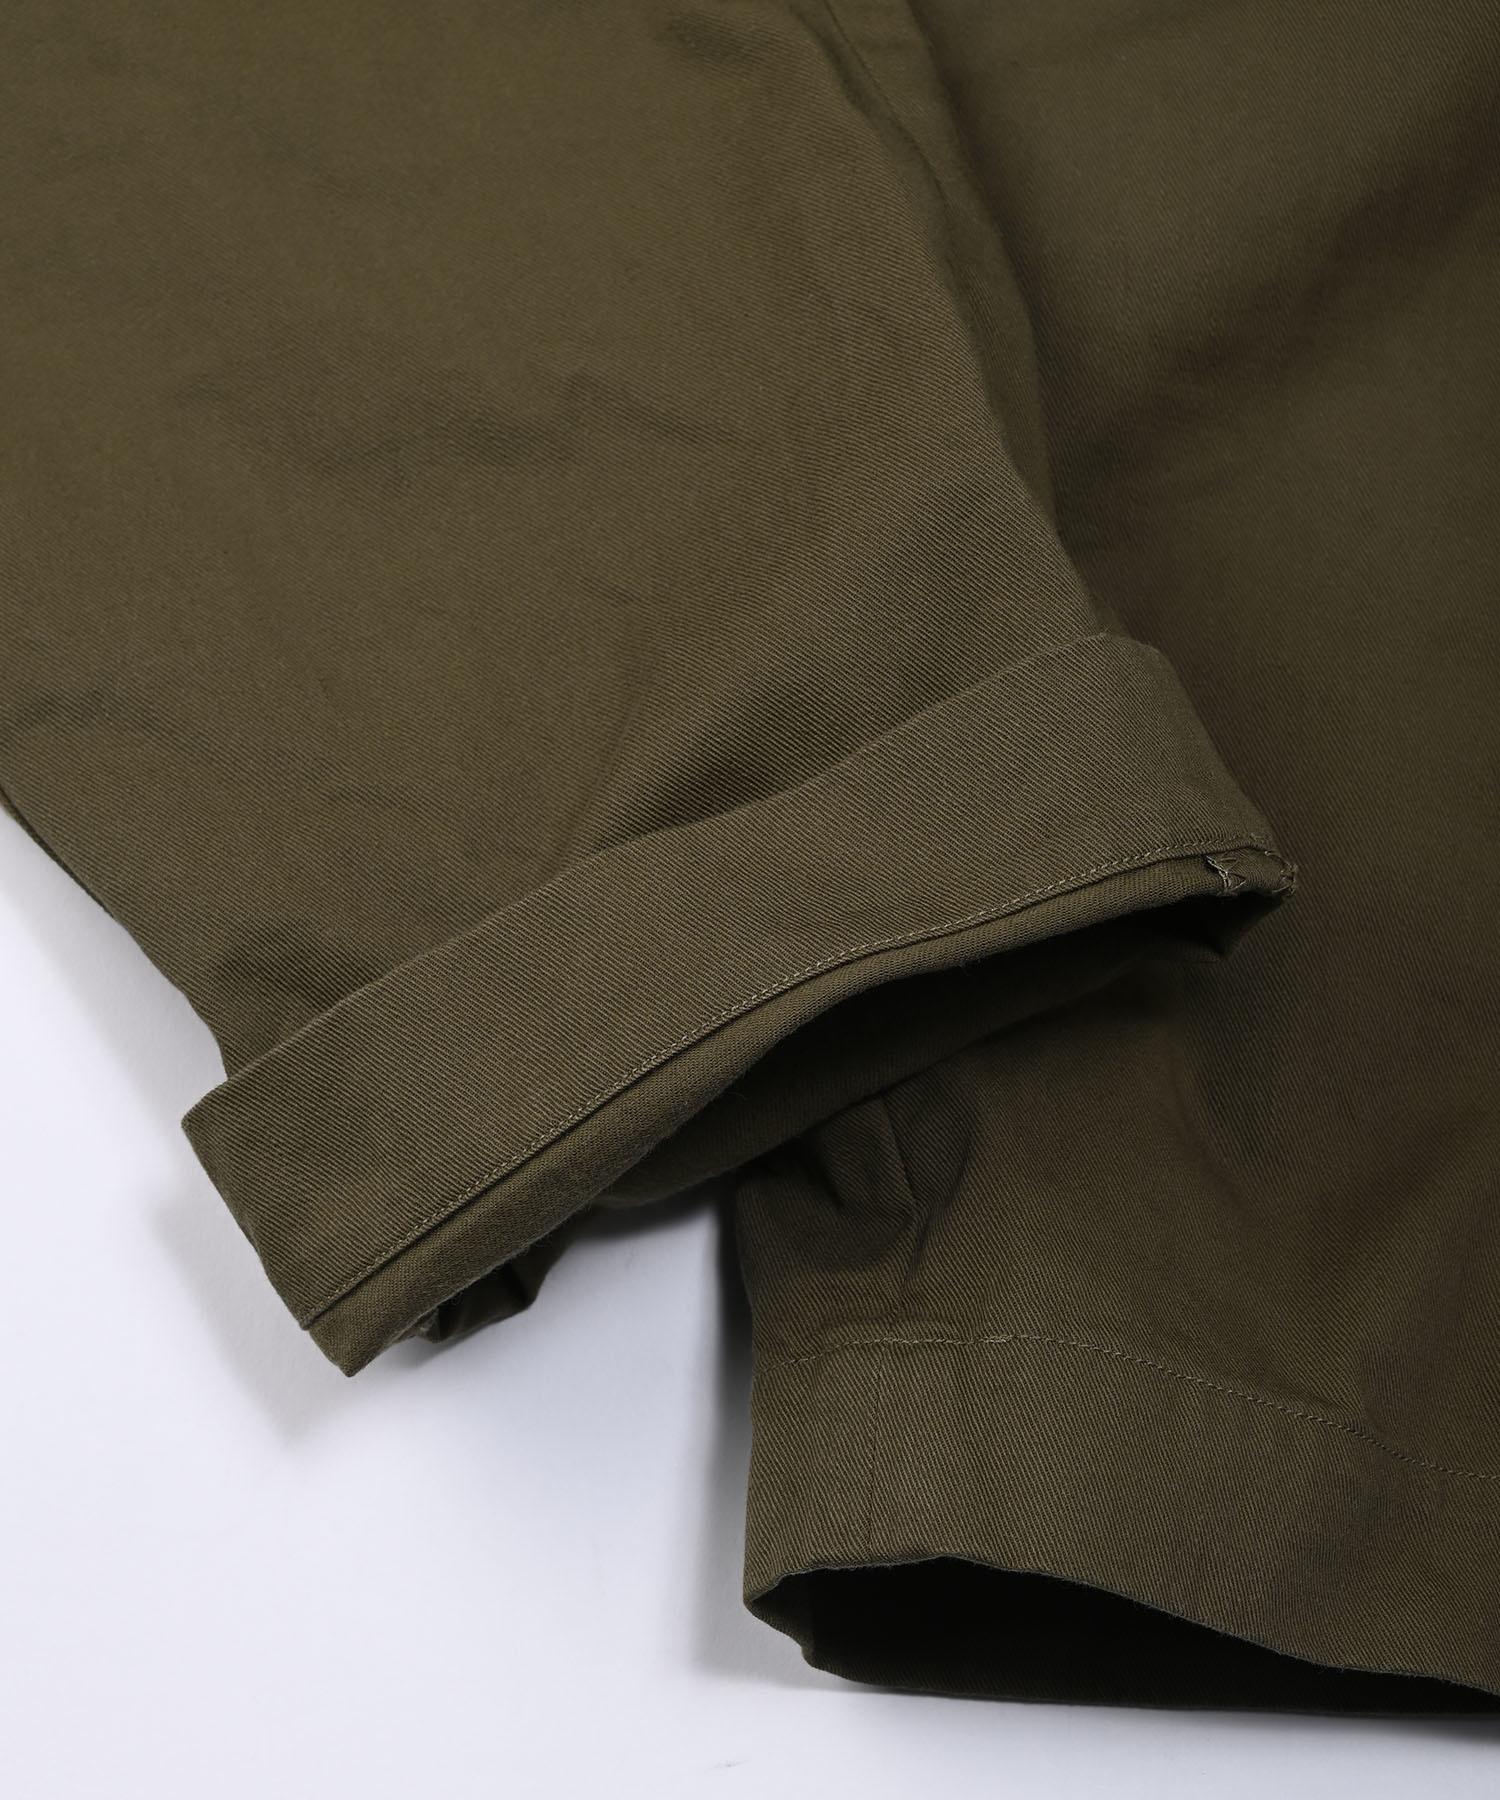 Okome Chino 908 Pants (0421)-9